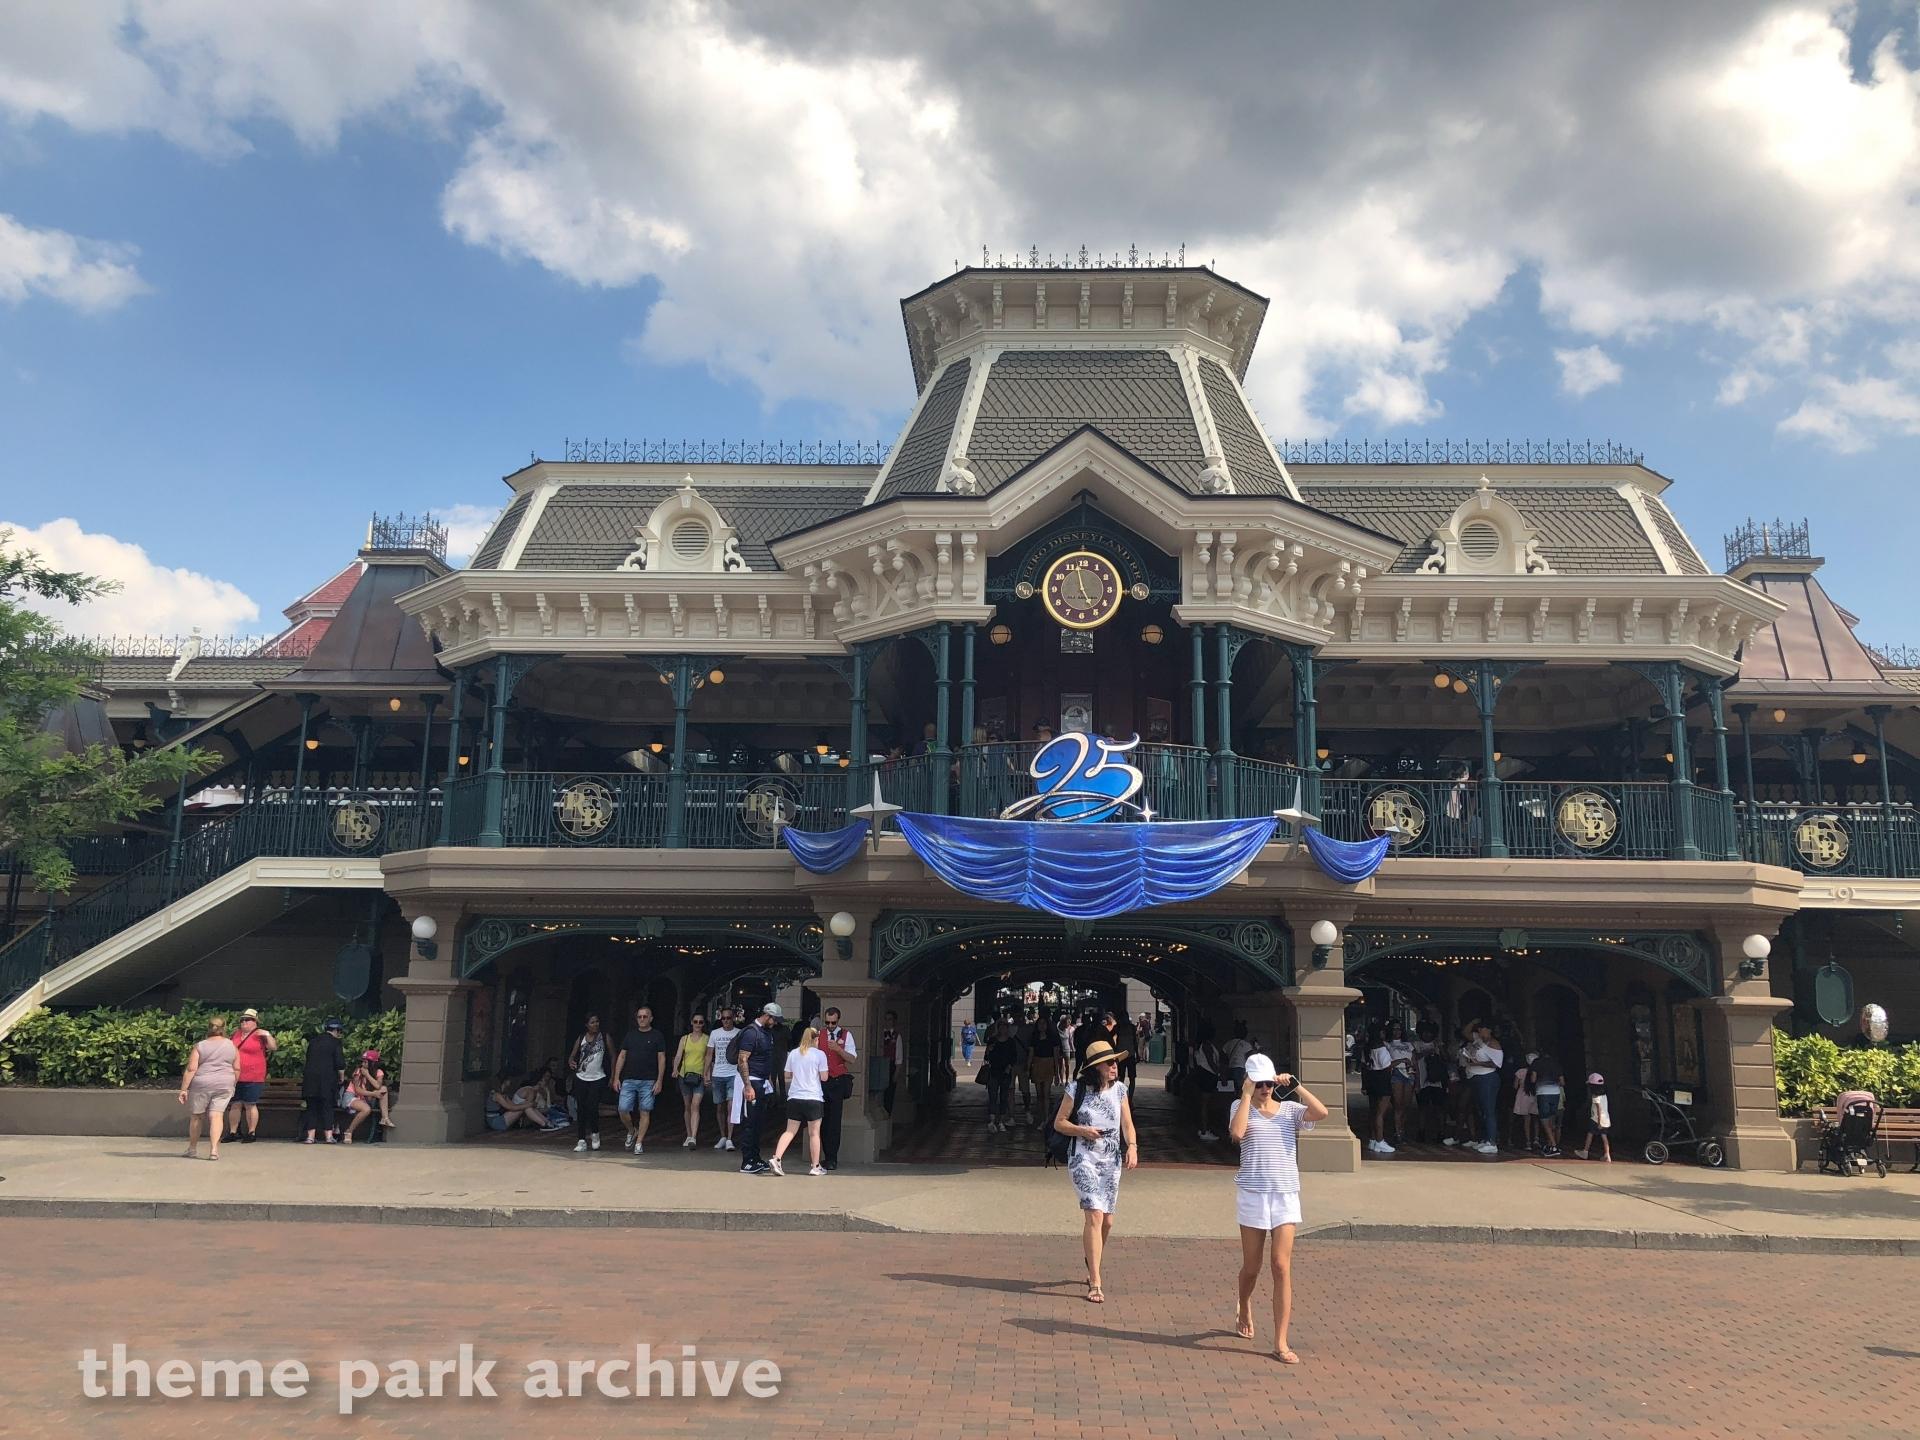 Entrance at Disneyland Paris